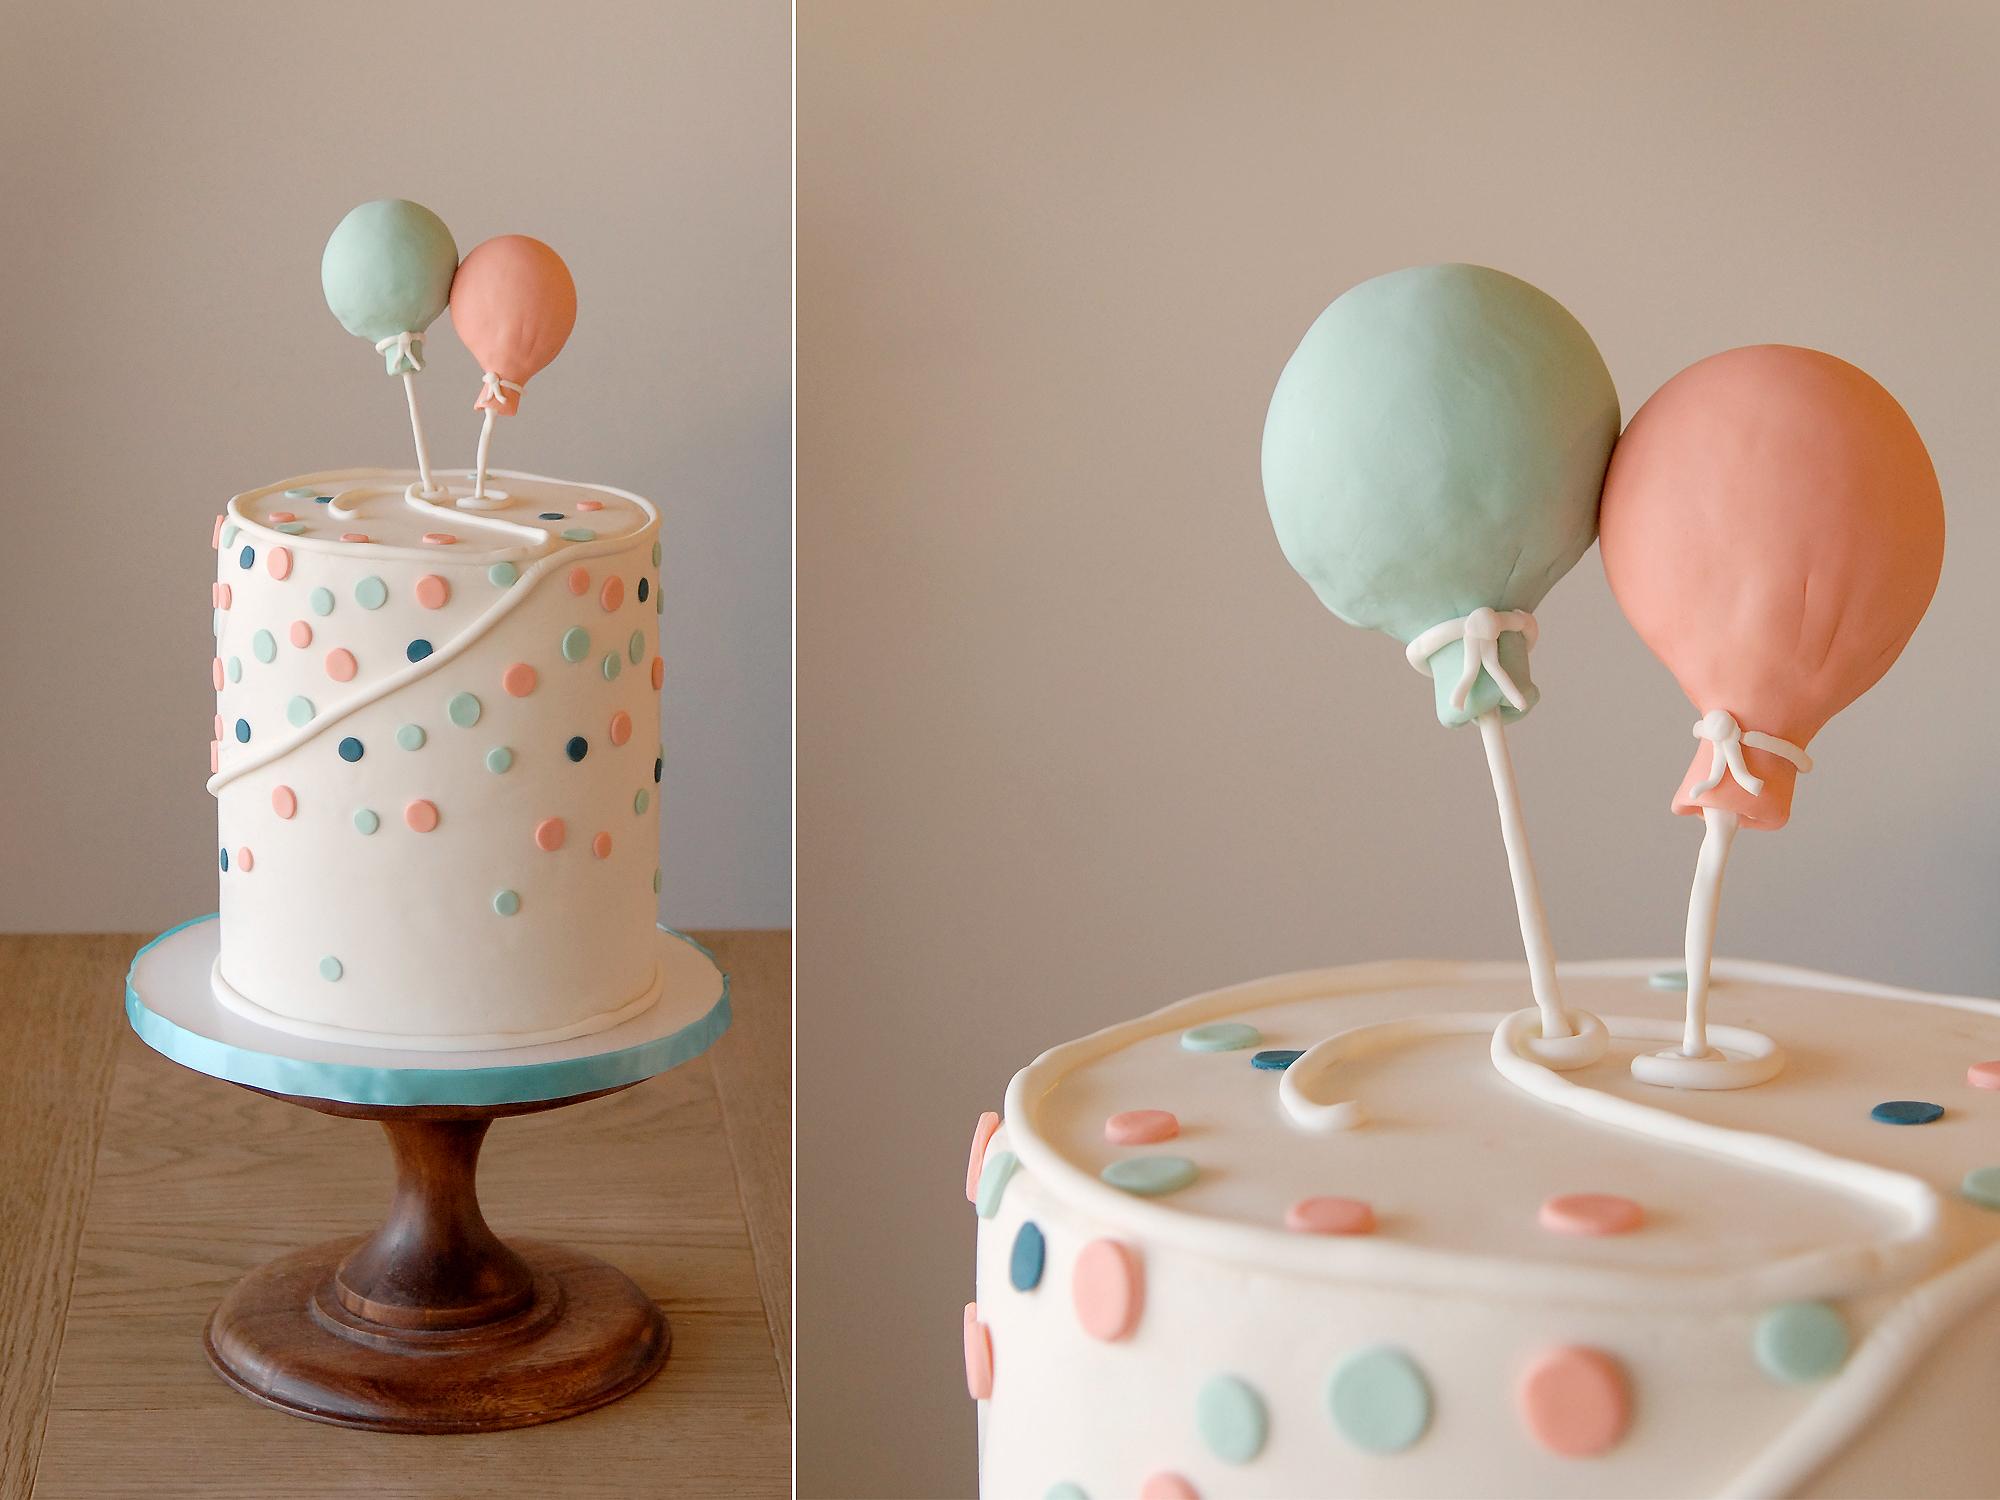 childrens_cake_gallery_021.jpg